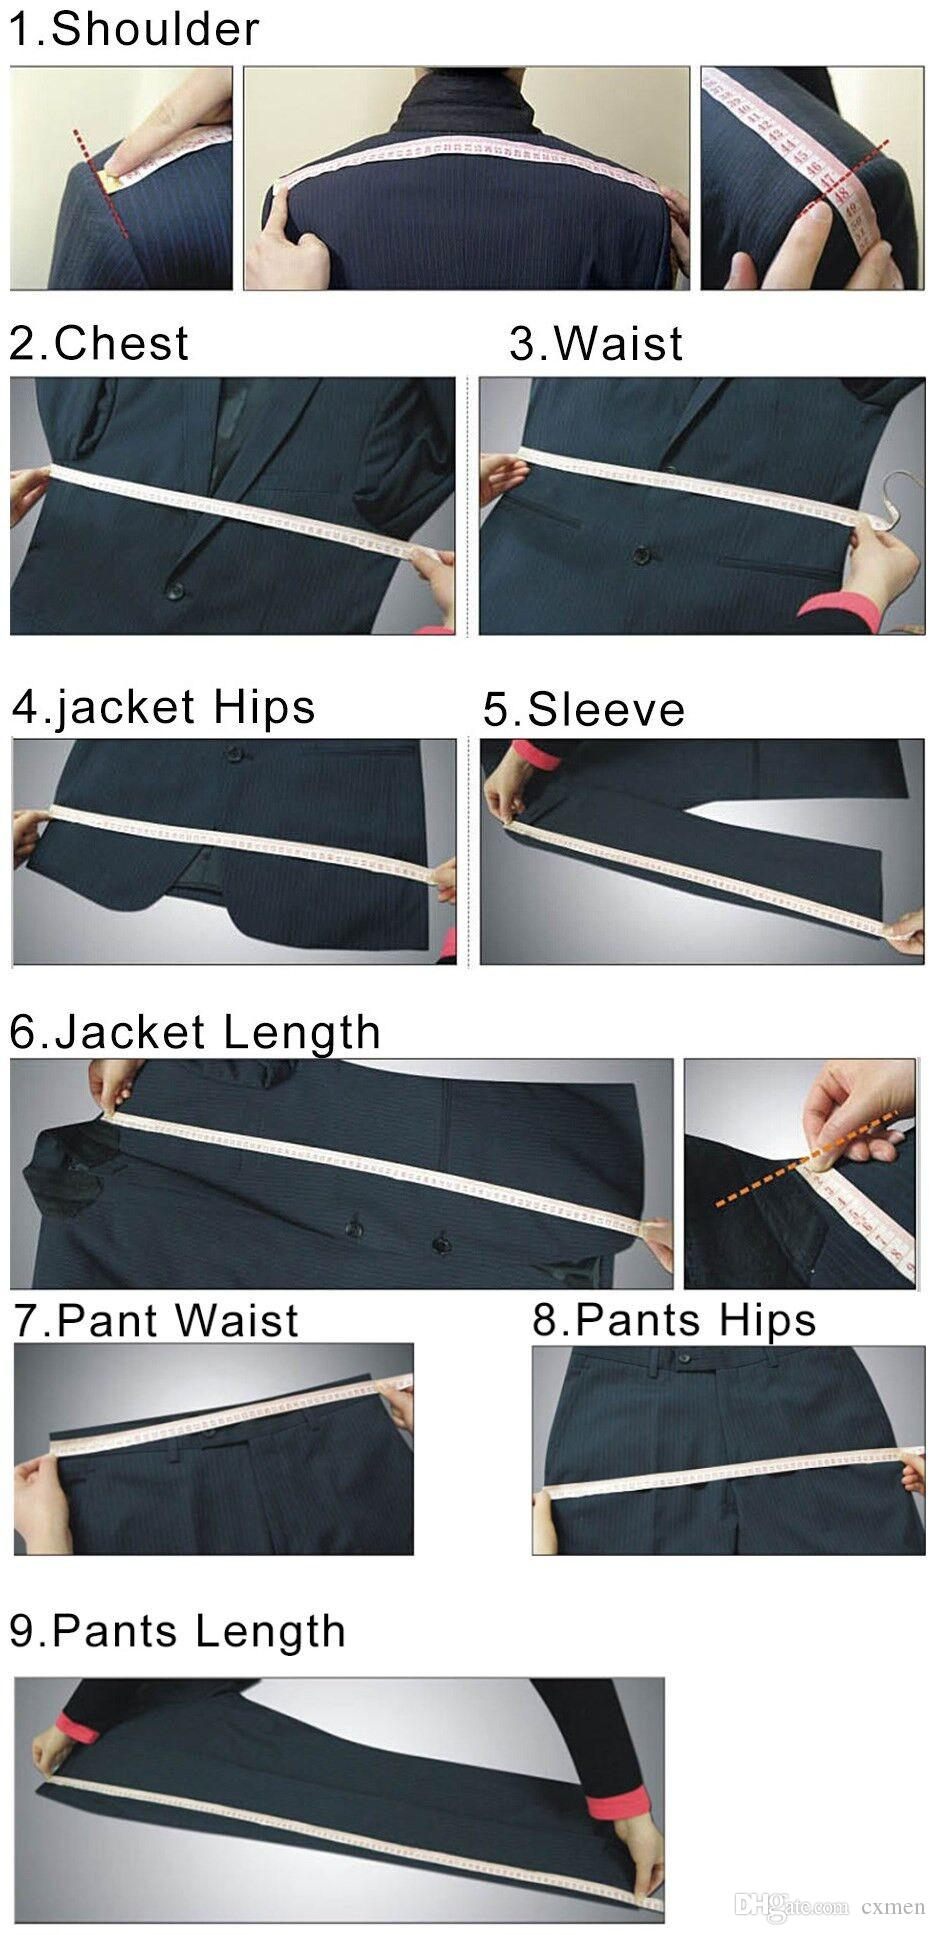 Blue Men Suit Wedding 2018 Custom Made Black Men Suit Slim Fit Best Men Blazer Handsome Groom Tuxedos Party Jacket+Pants+Vest